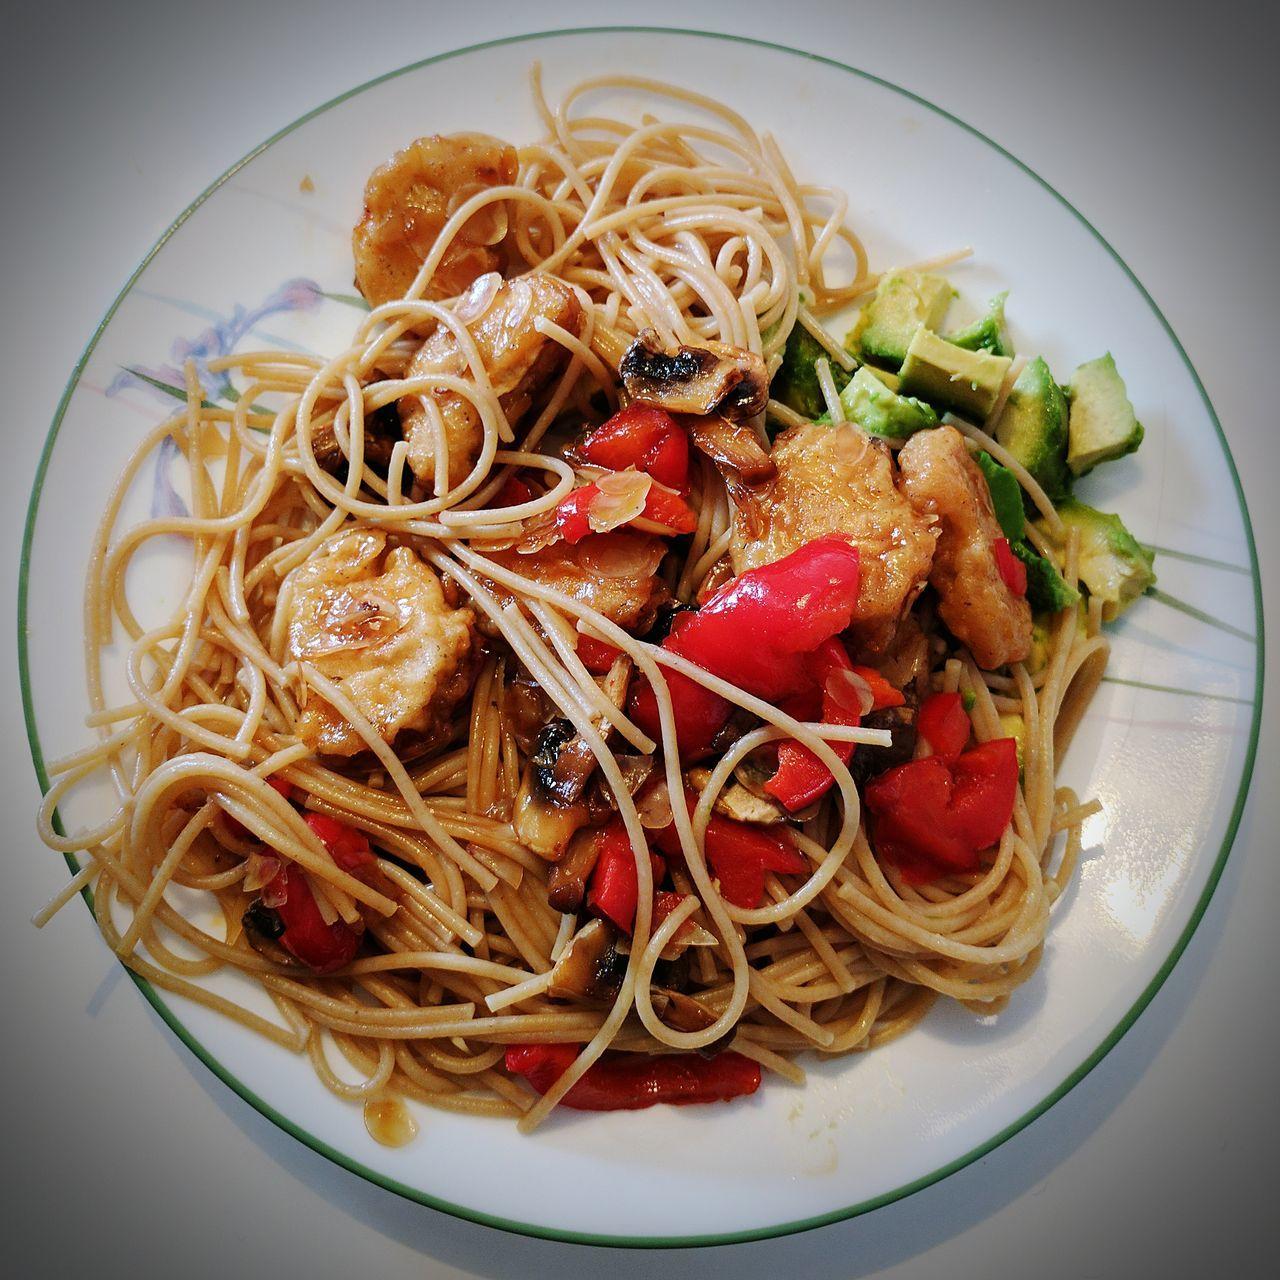 Veganúar - Veganuary. Food Freshness Healthy Eating Close-up Plate Veganfood Vegan Veganism Veganuary Veganúar Avocado Gardein Mushrooms Spaghetti <3 Almond